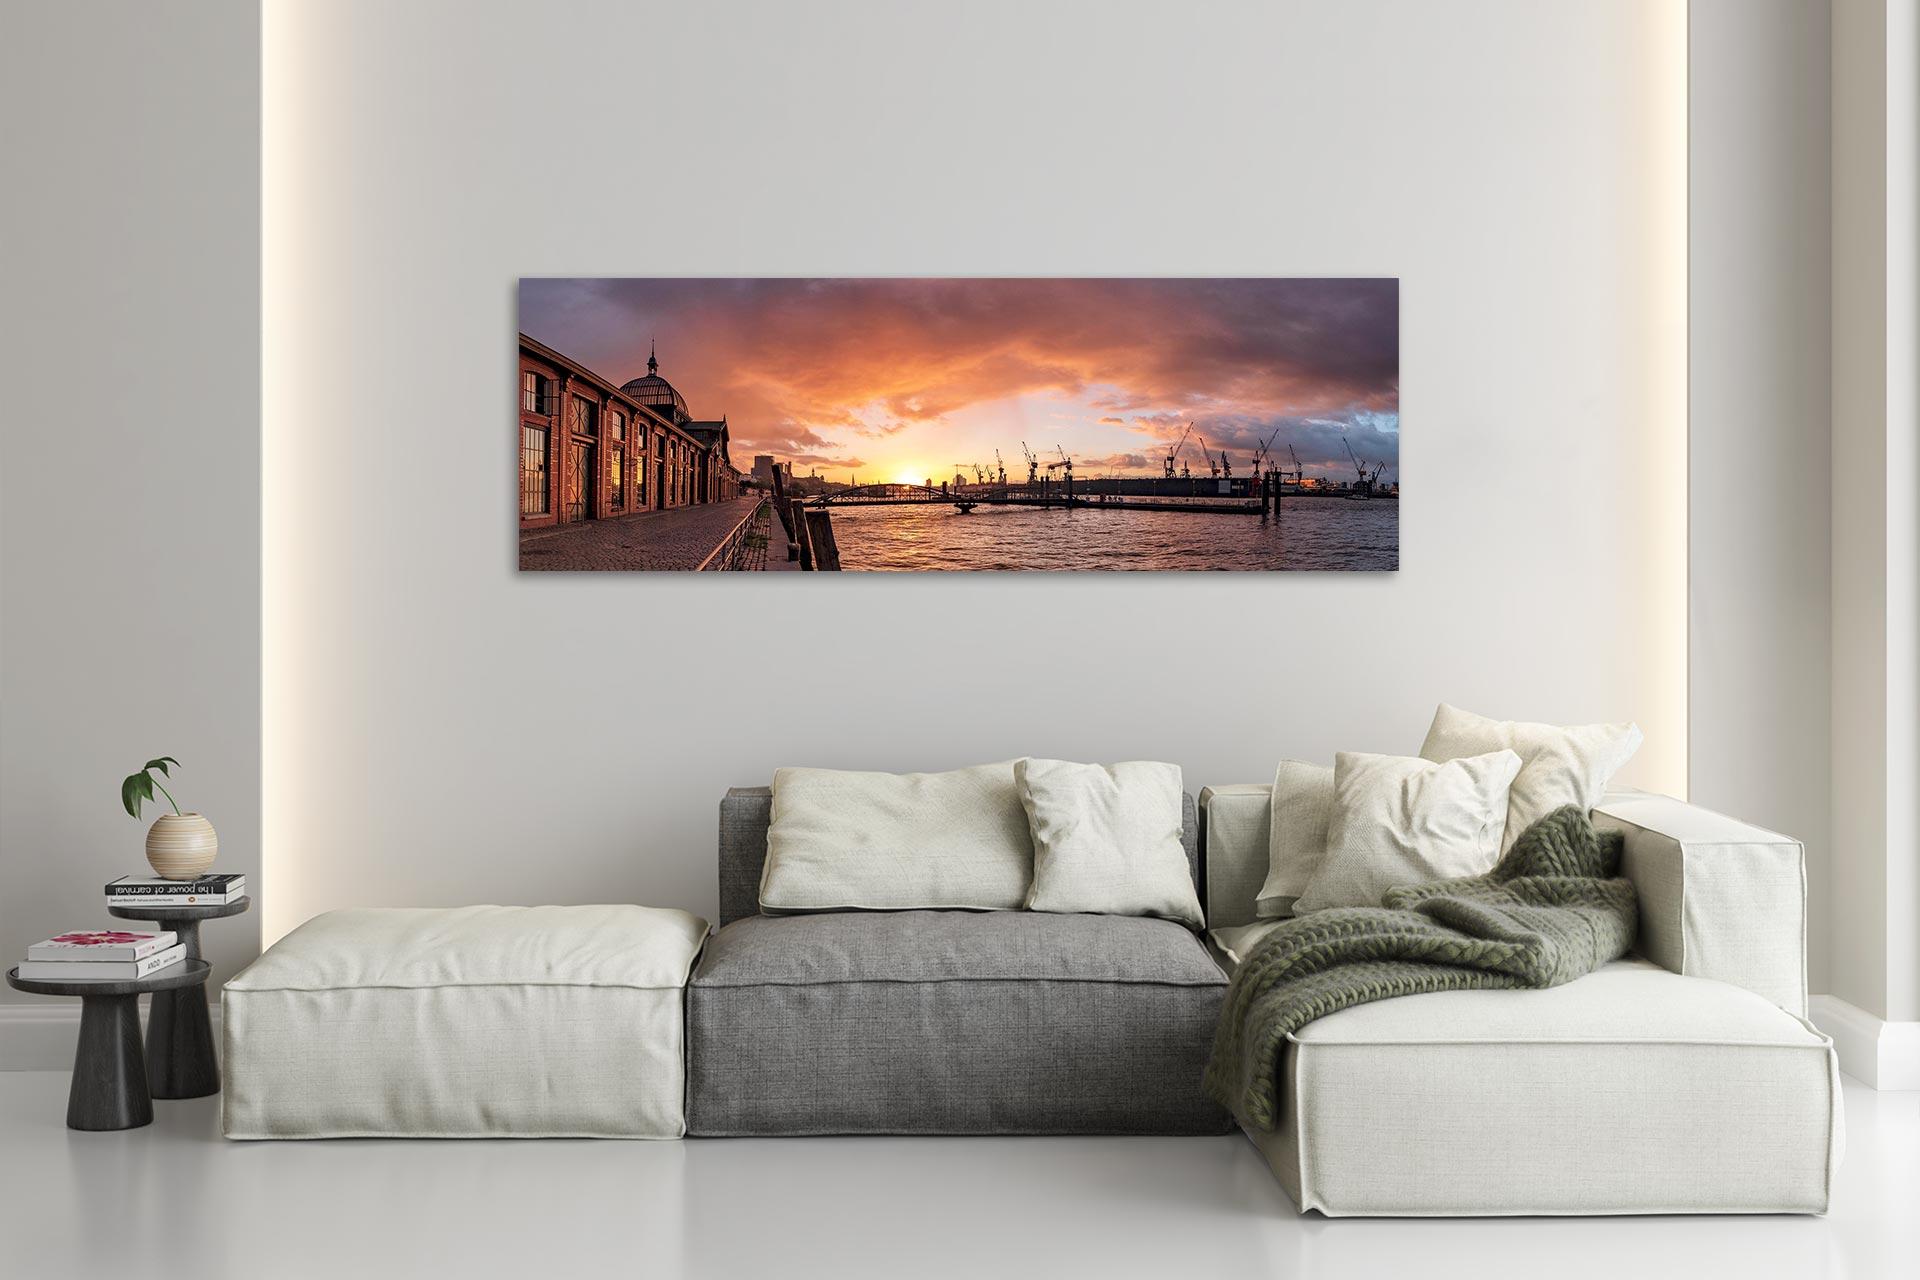 PSW104-morgenrot-hamburg-wandbild-auf-leinwand-acrylglas-aludibond-wohnzimmer